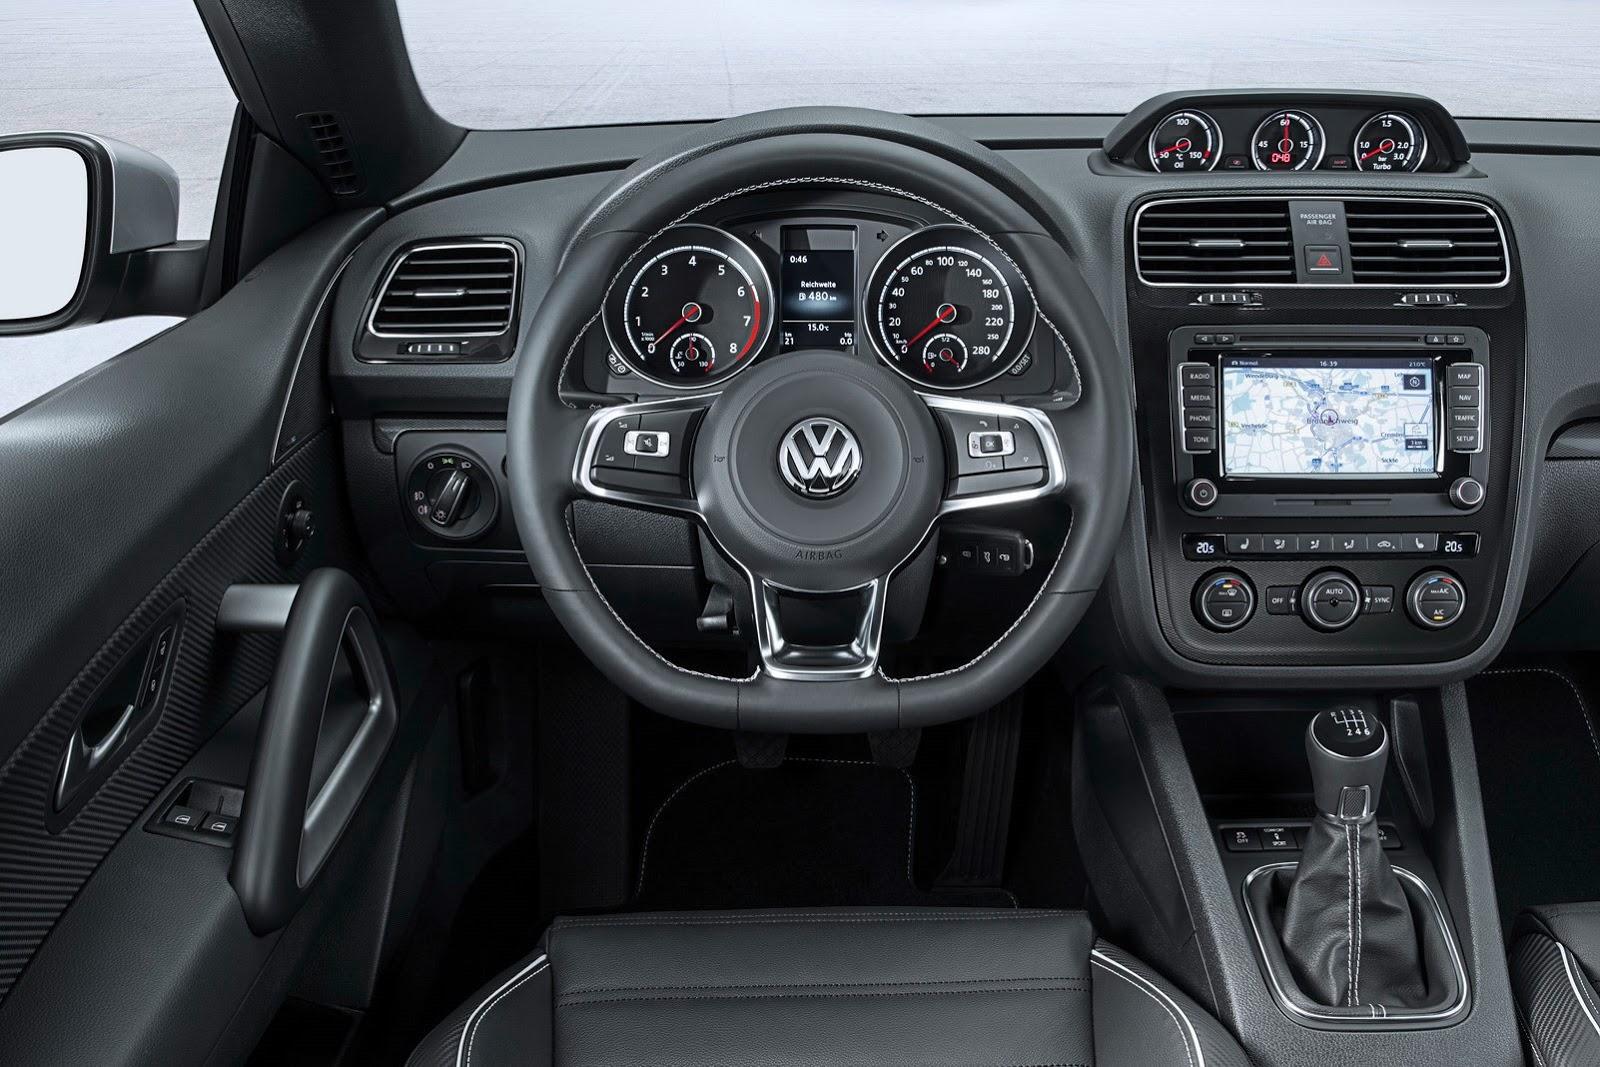 2014 volkswagen scirocco facelift revealed drops 1 4 tsi. Black Bedroom Furniture Sets. Home Design Ideas